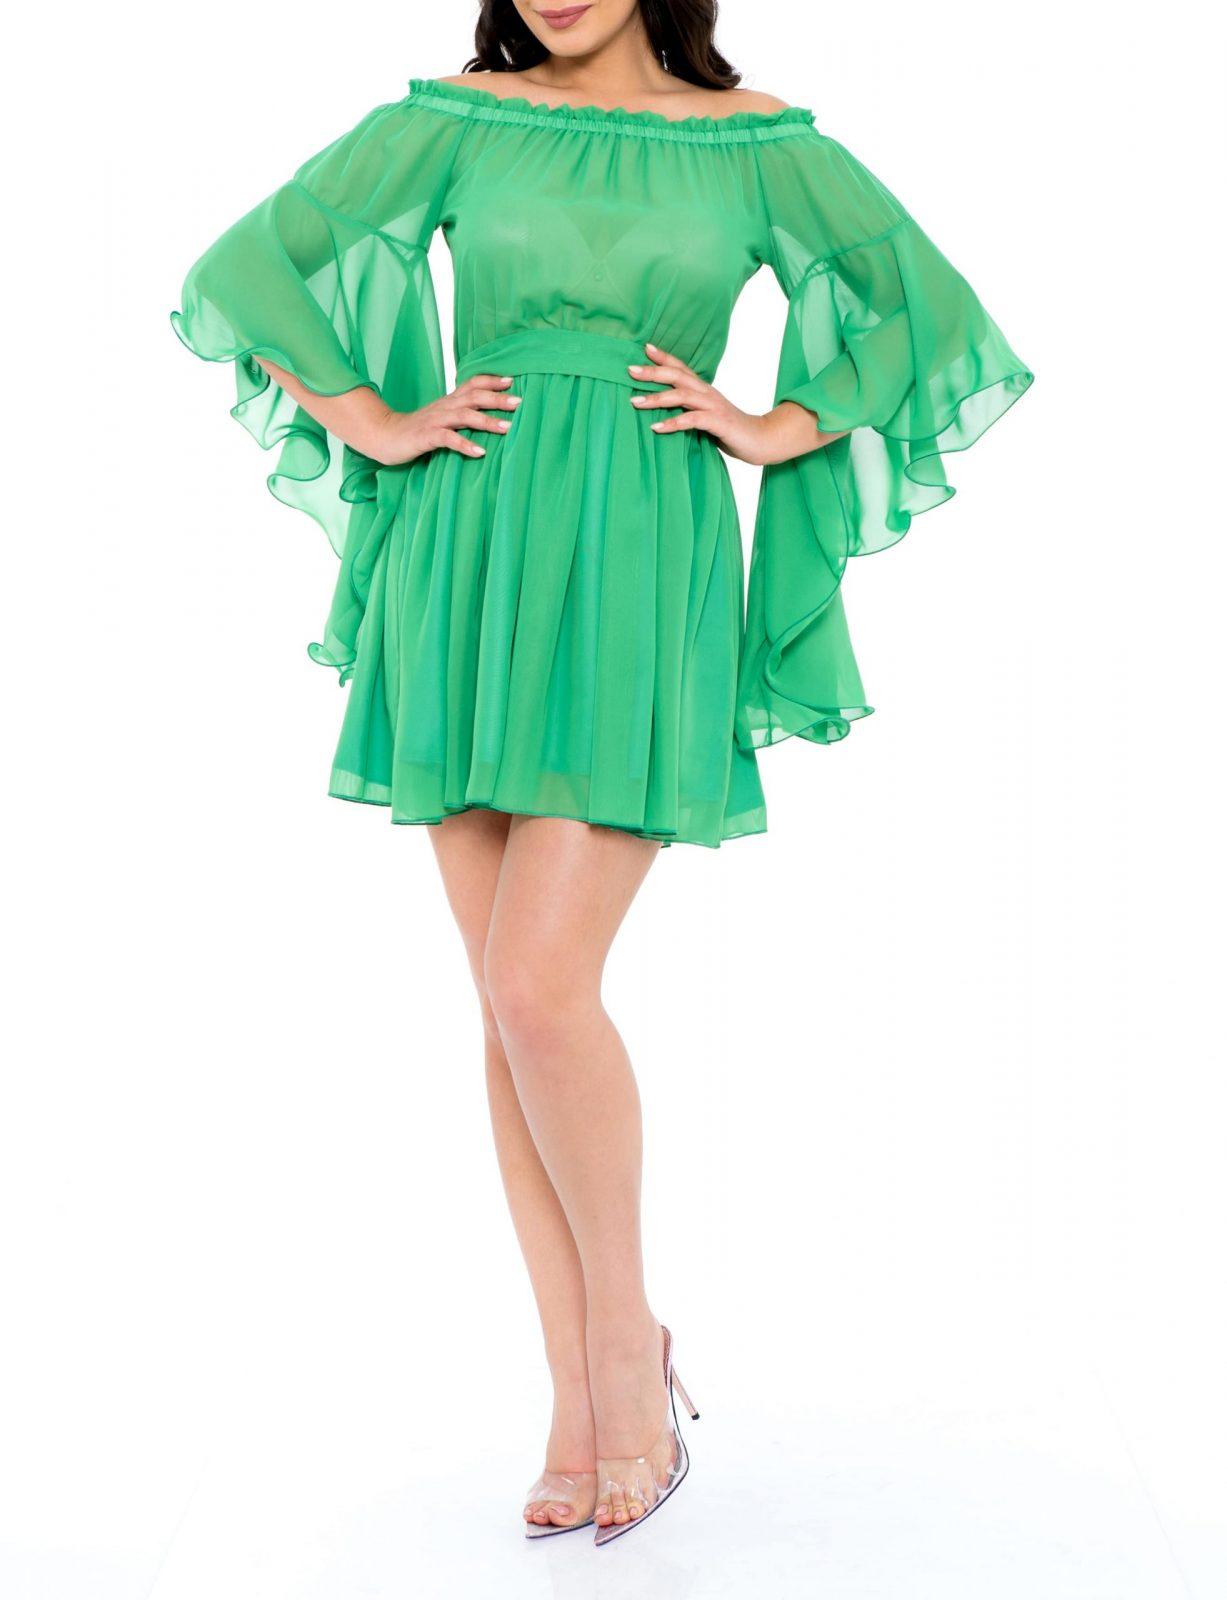 Lucia Verde (2) Min